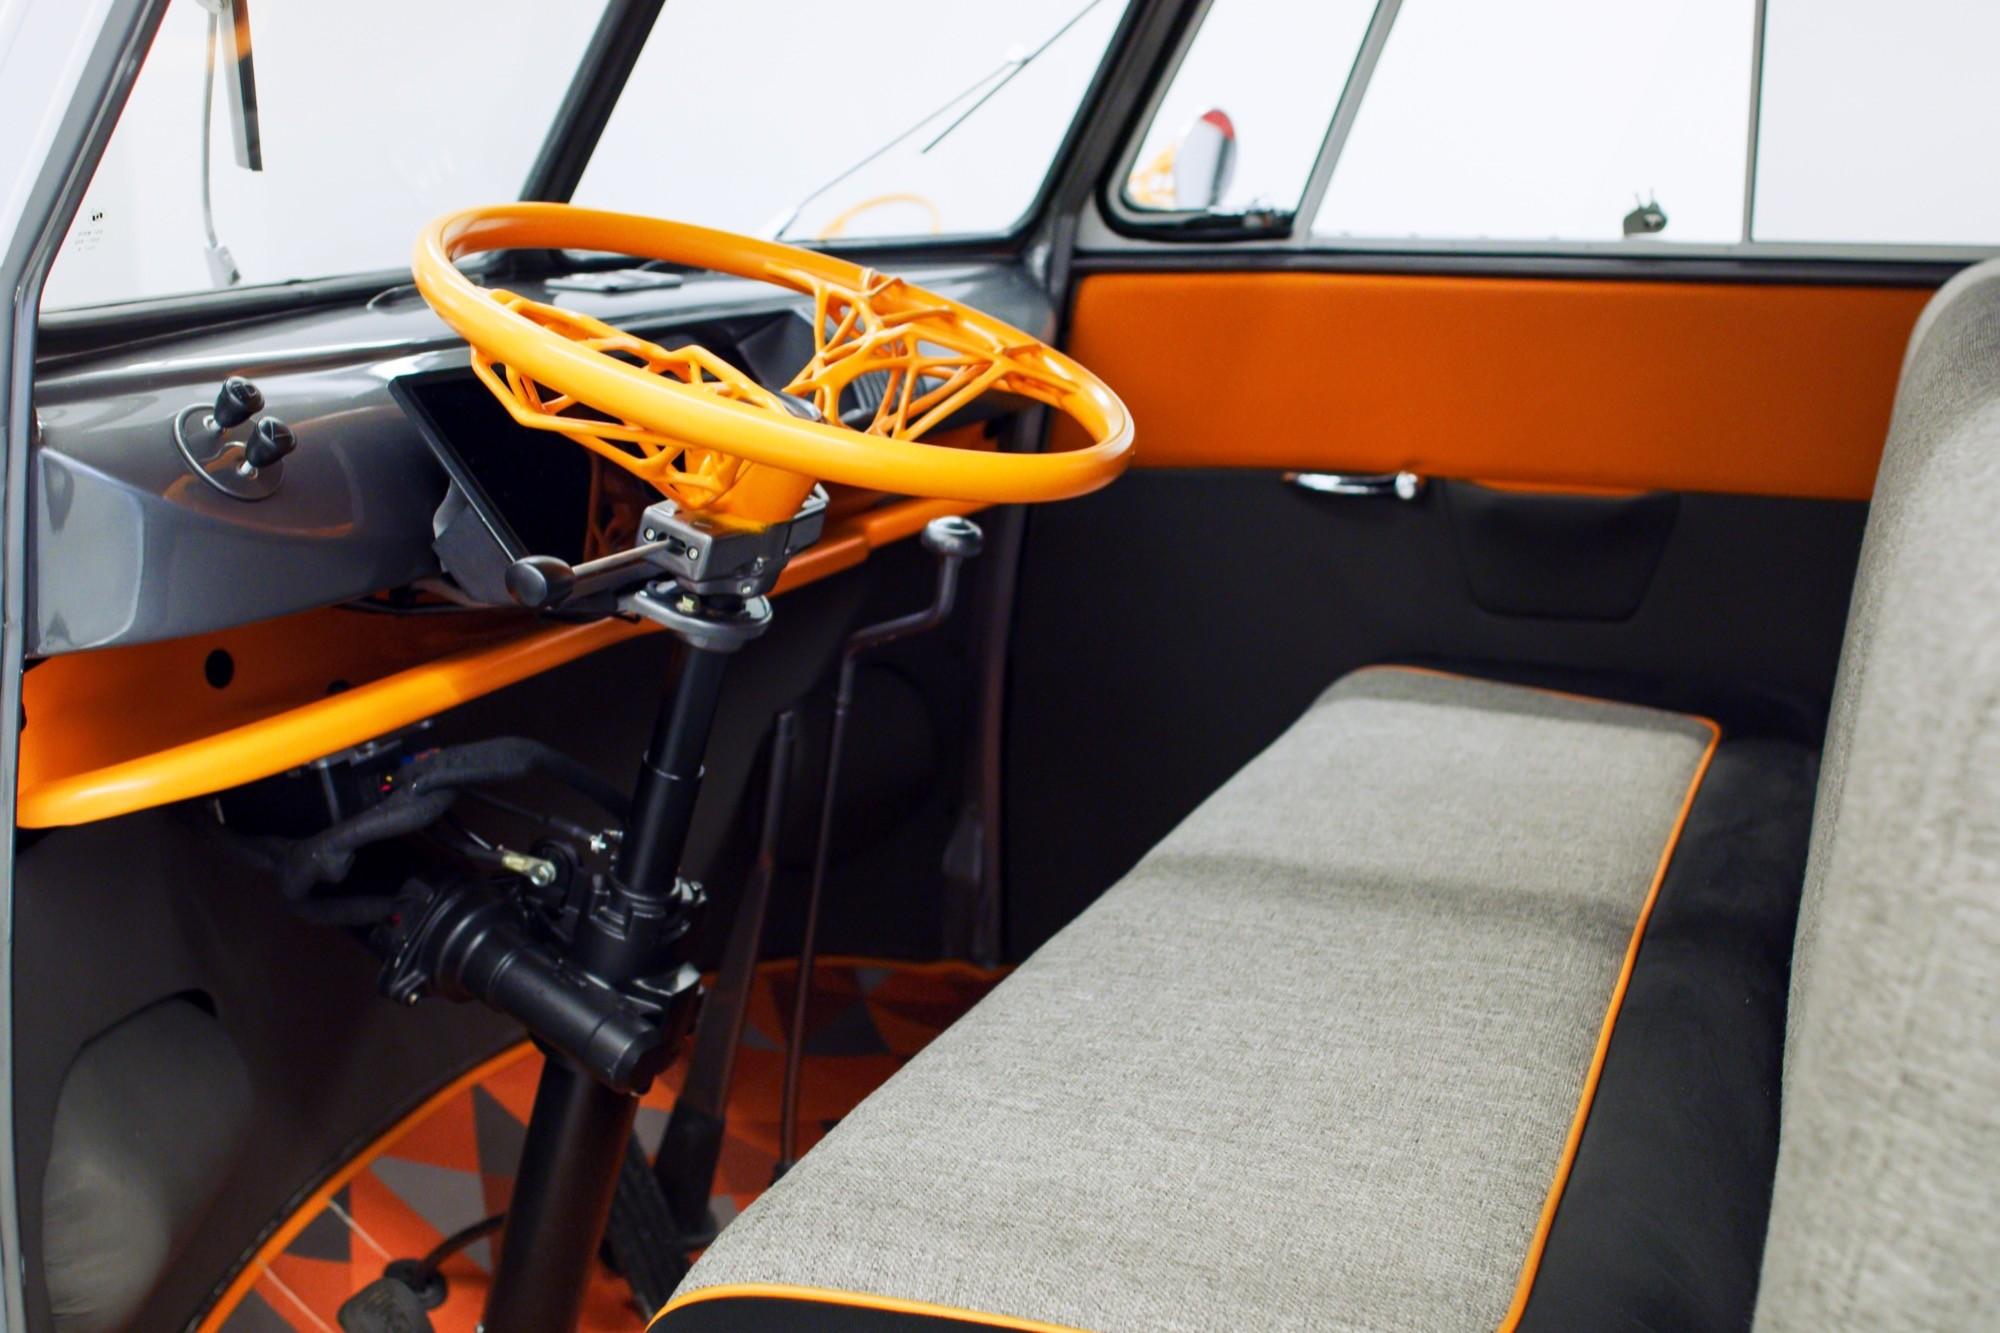 Bus: Volkswagen elektrifiziert den alten Bulli - Volkswagen Typ 20 (Bild: Volkswagen USA)